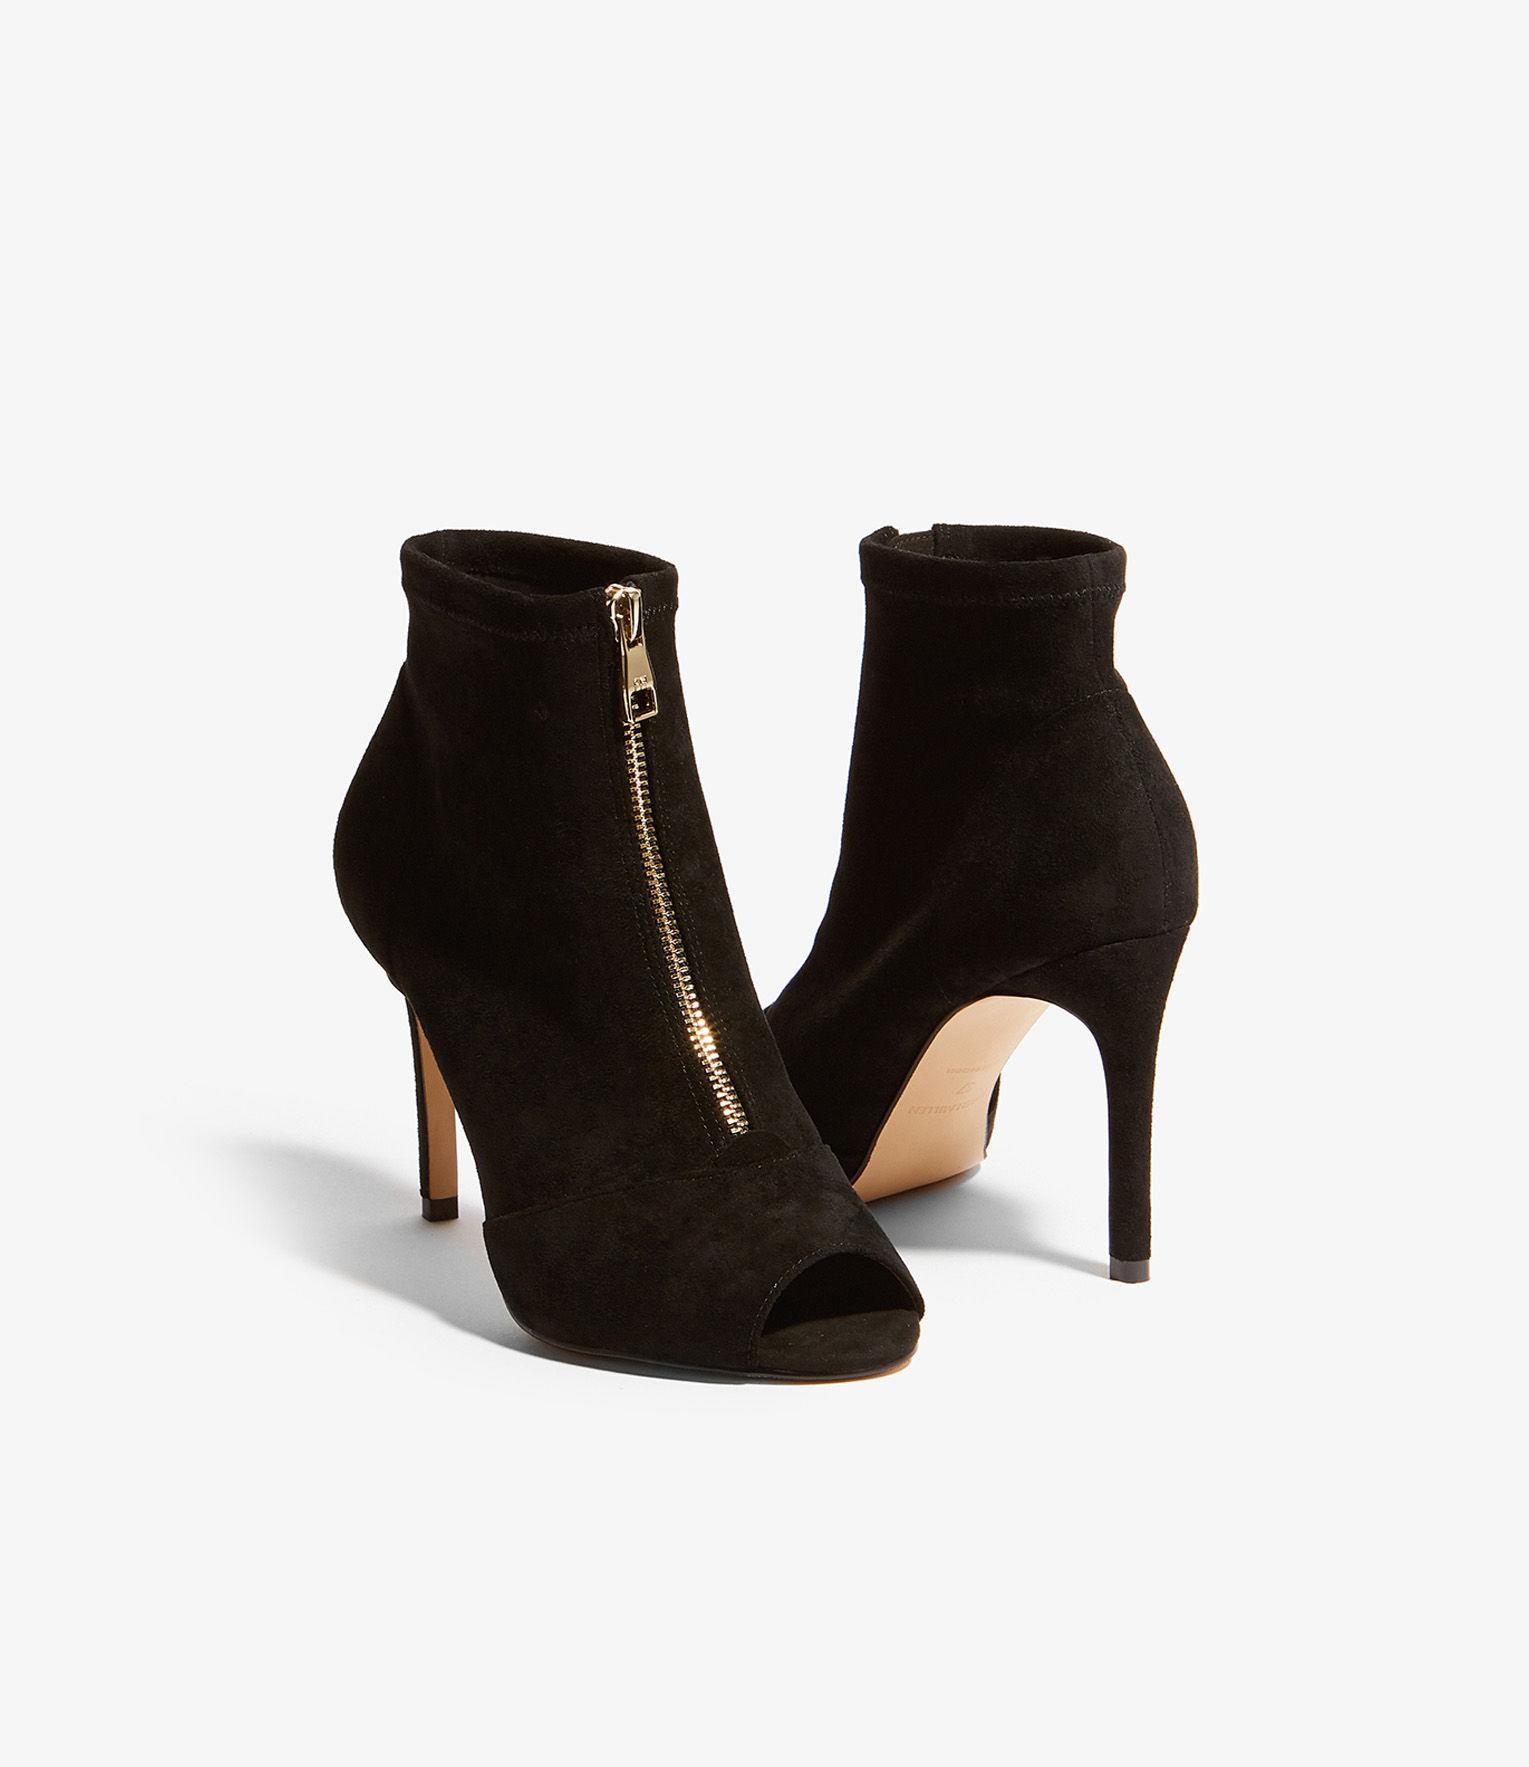 41e784cc0577 Karen Millen - Black Peep-toe Boots - Lyst. View fullscreen